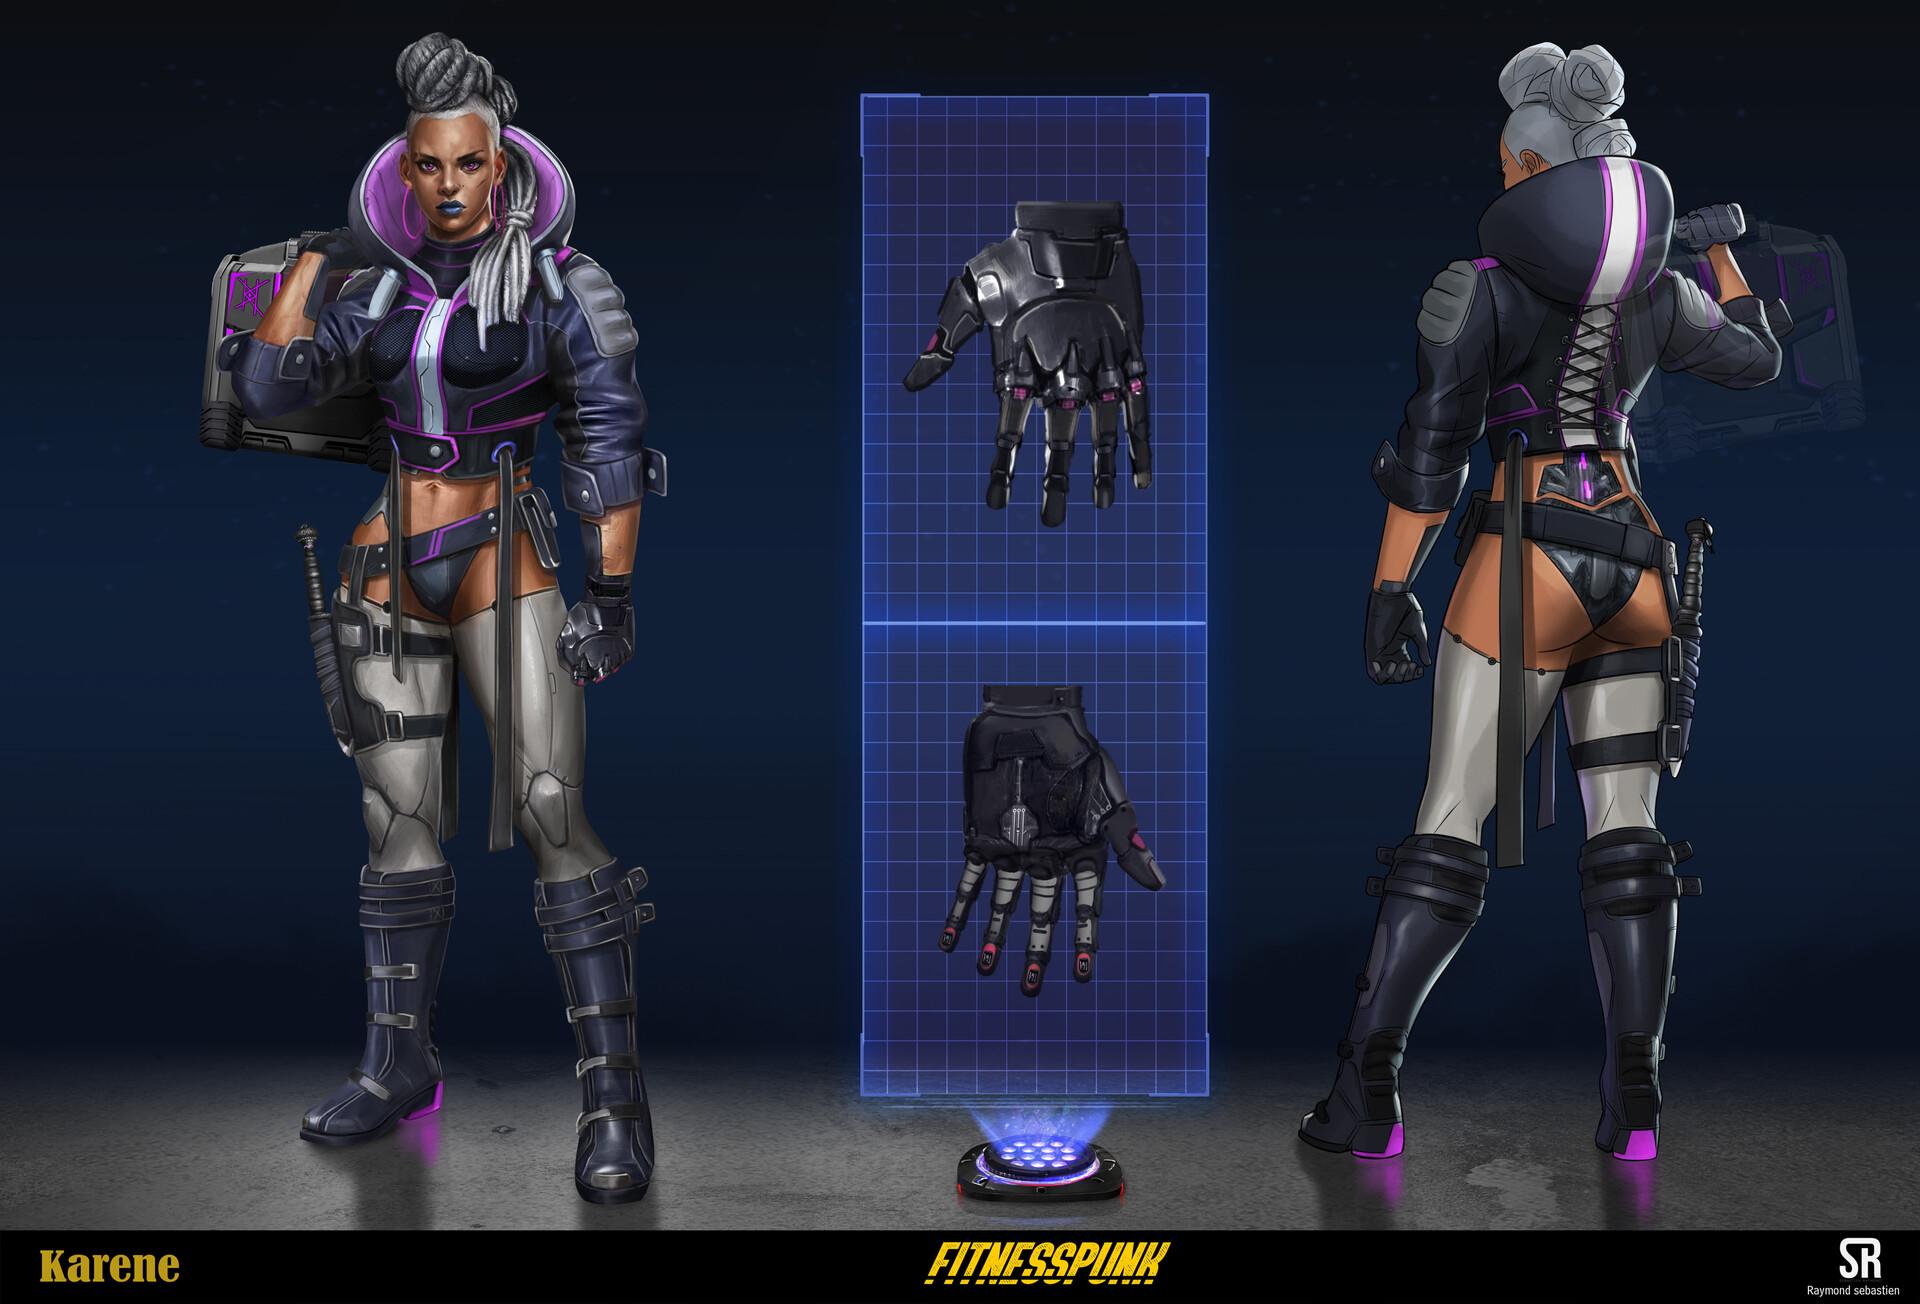 Karene final character design